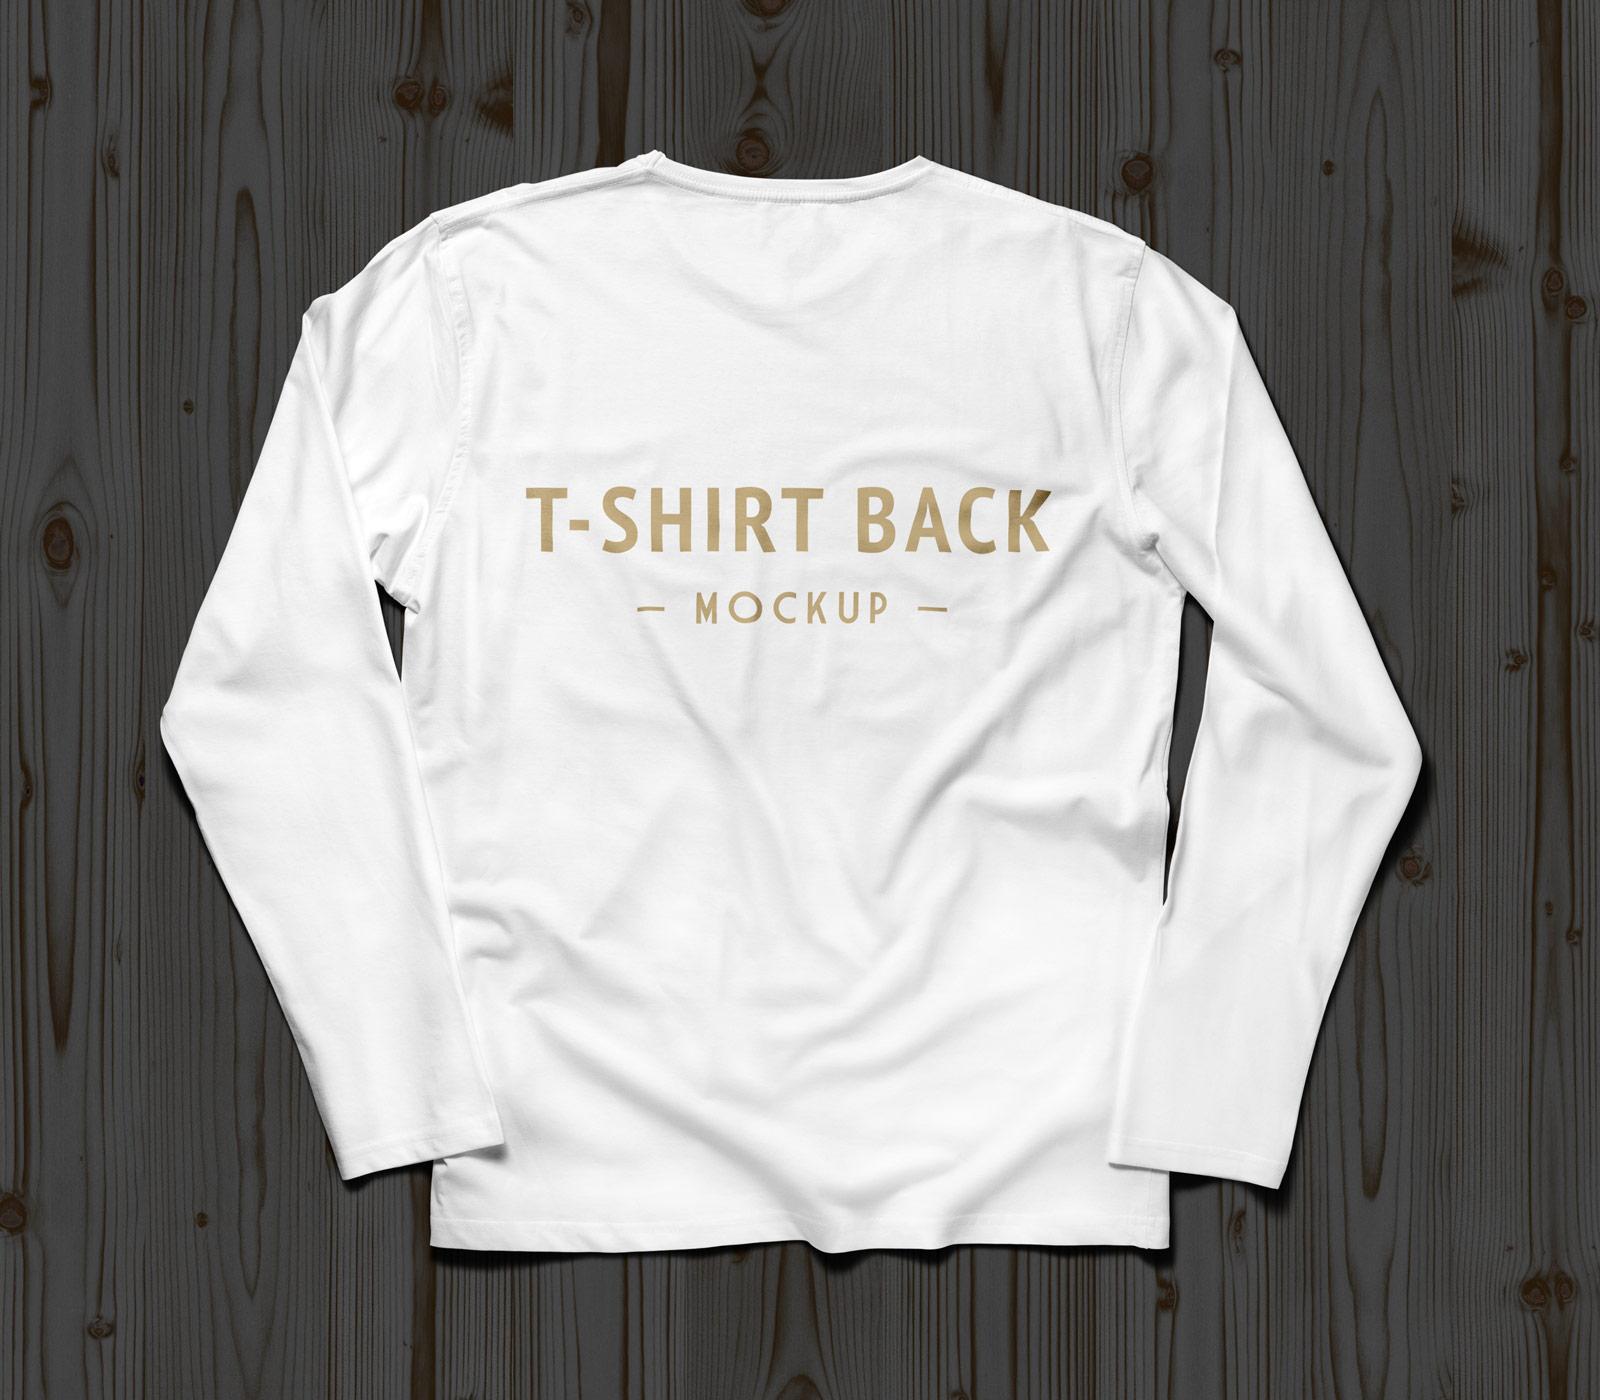 Free-White-Full-Sleeves-T-shirt-Mockup-PSD-File